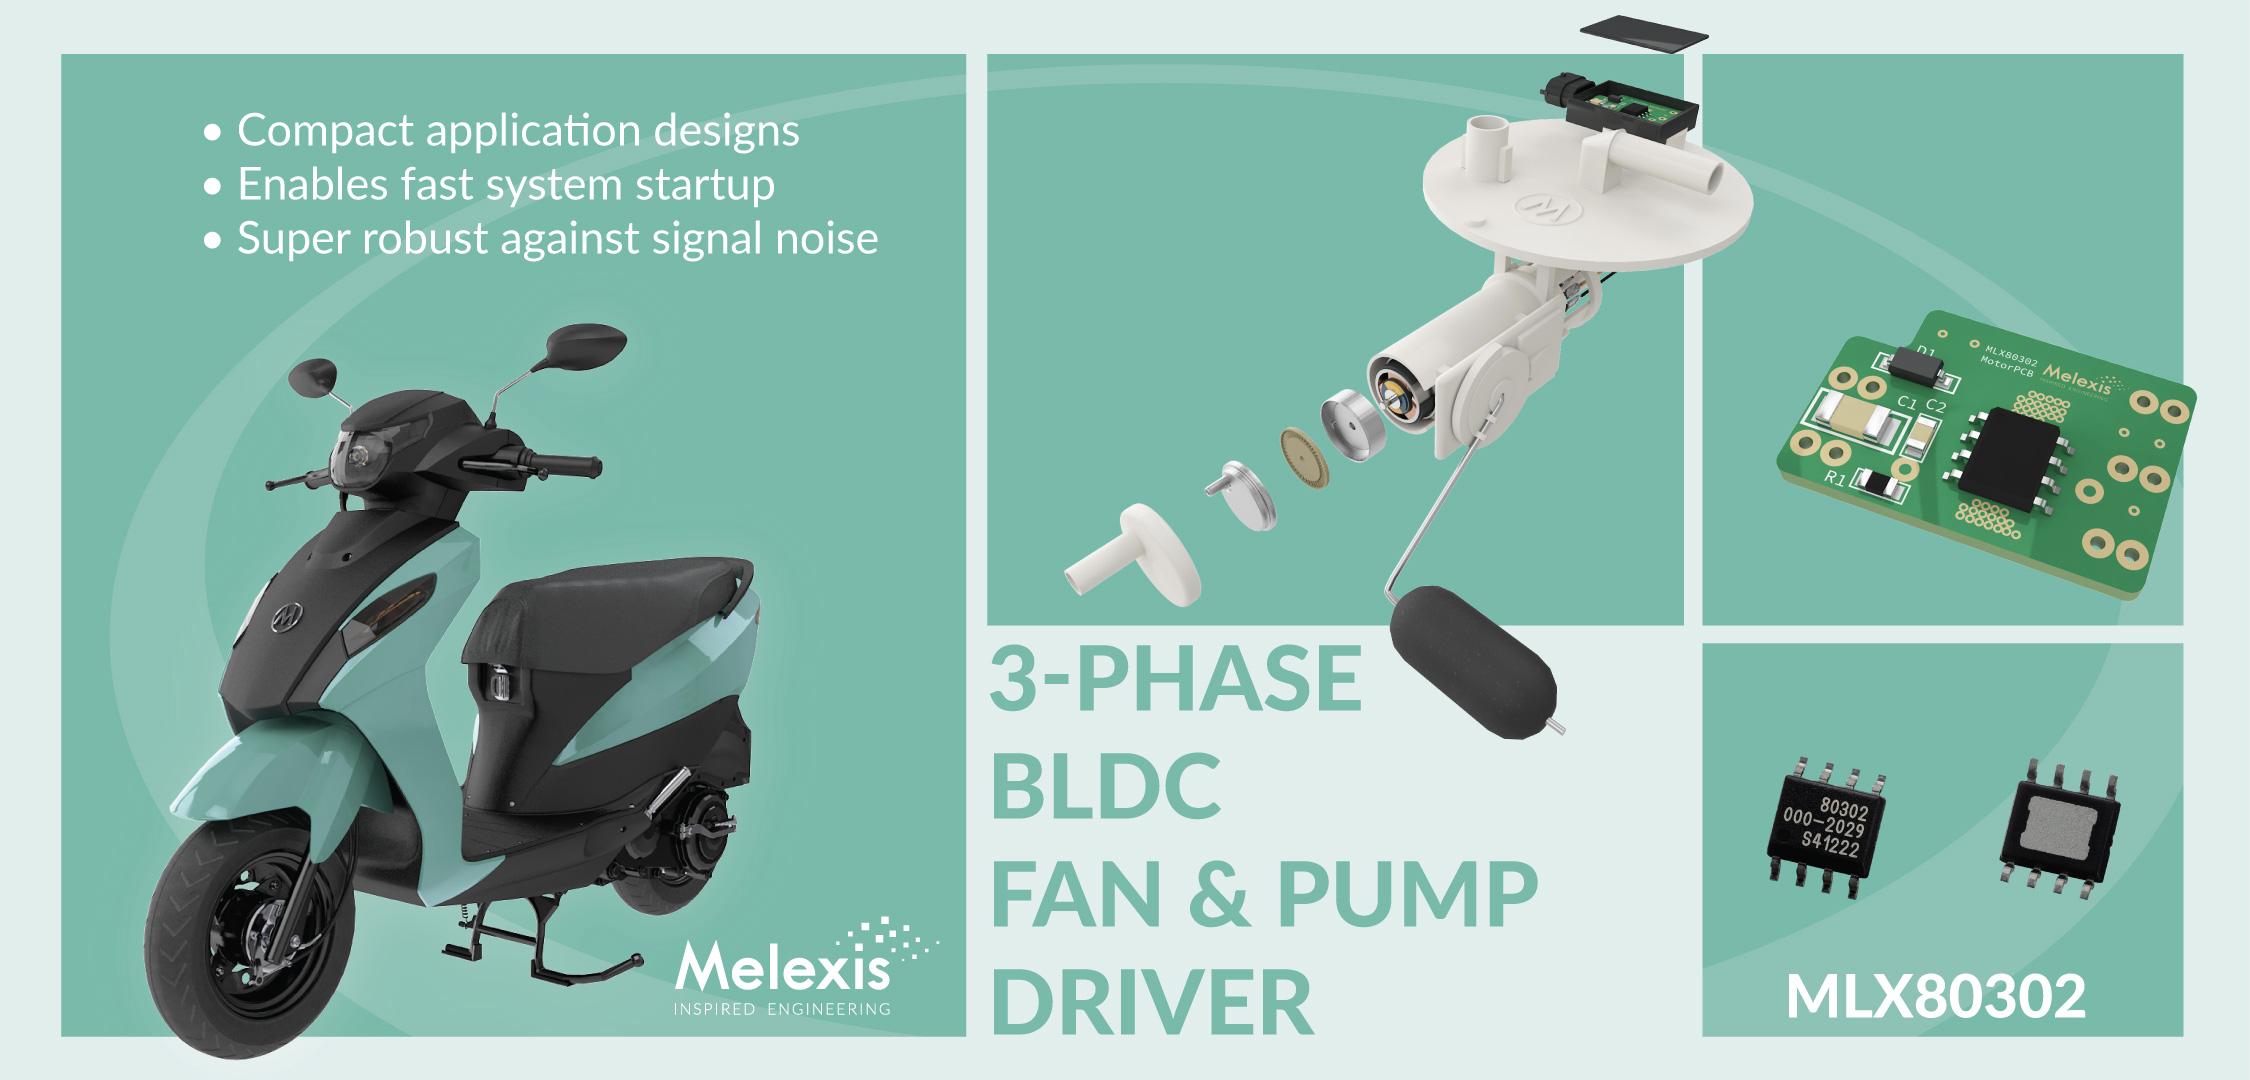 Melexis 推出新一代市场领先的摩托车燃油泵控制器